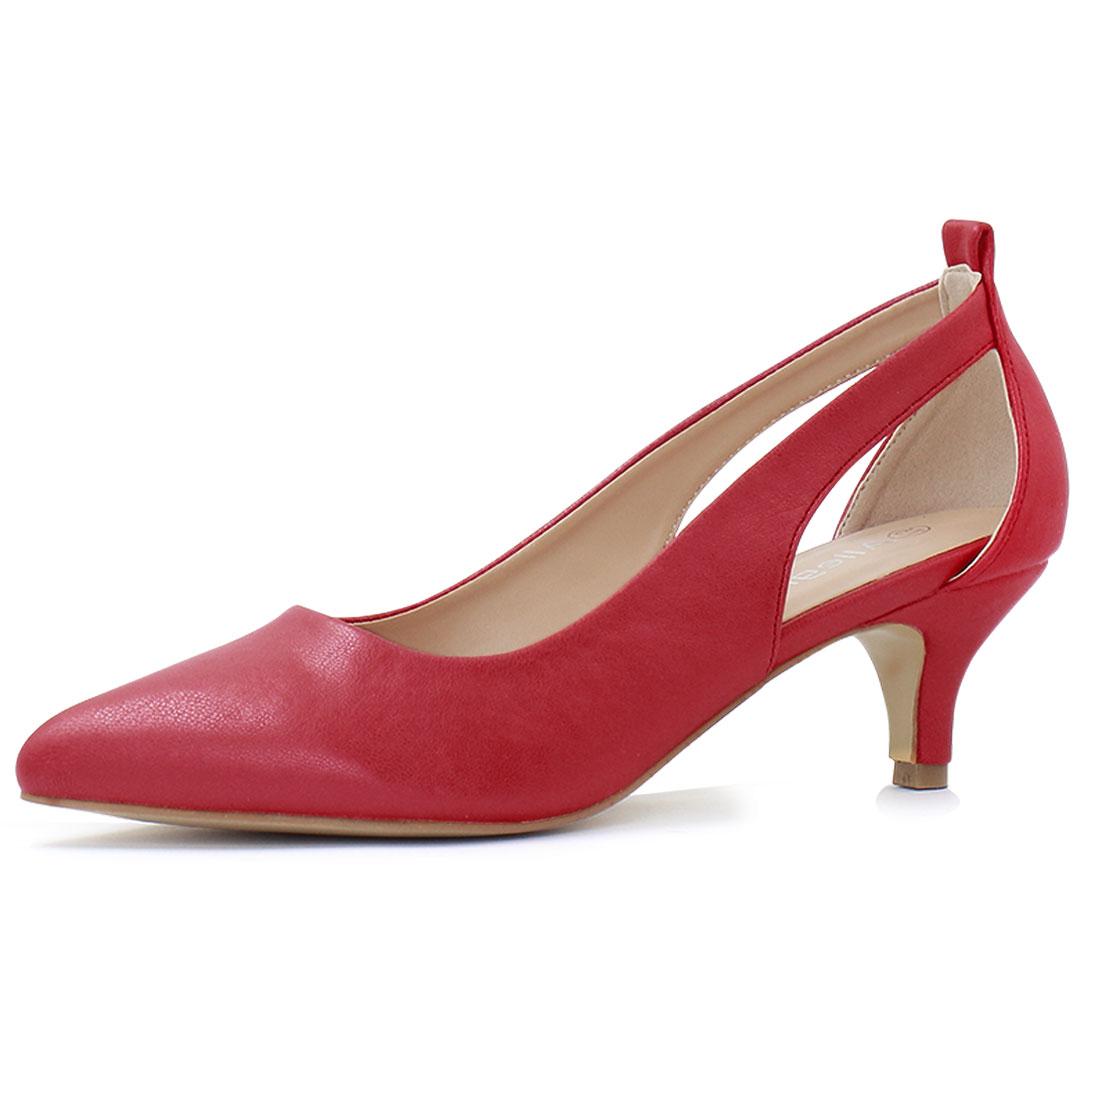 Allegra K Women's Cutout Sides Pointed Toe Kitten Heel Pumps Red US 9.5